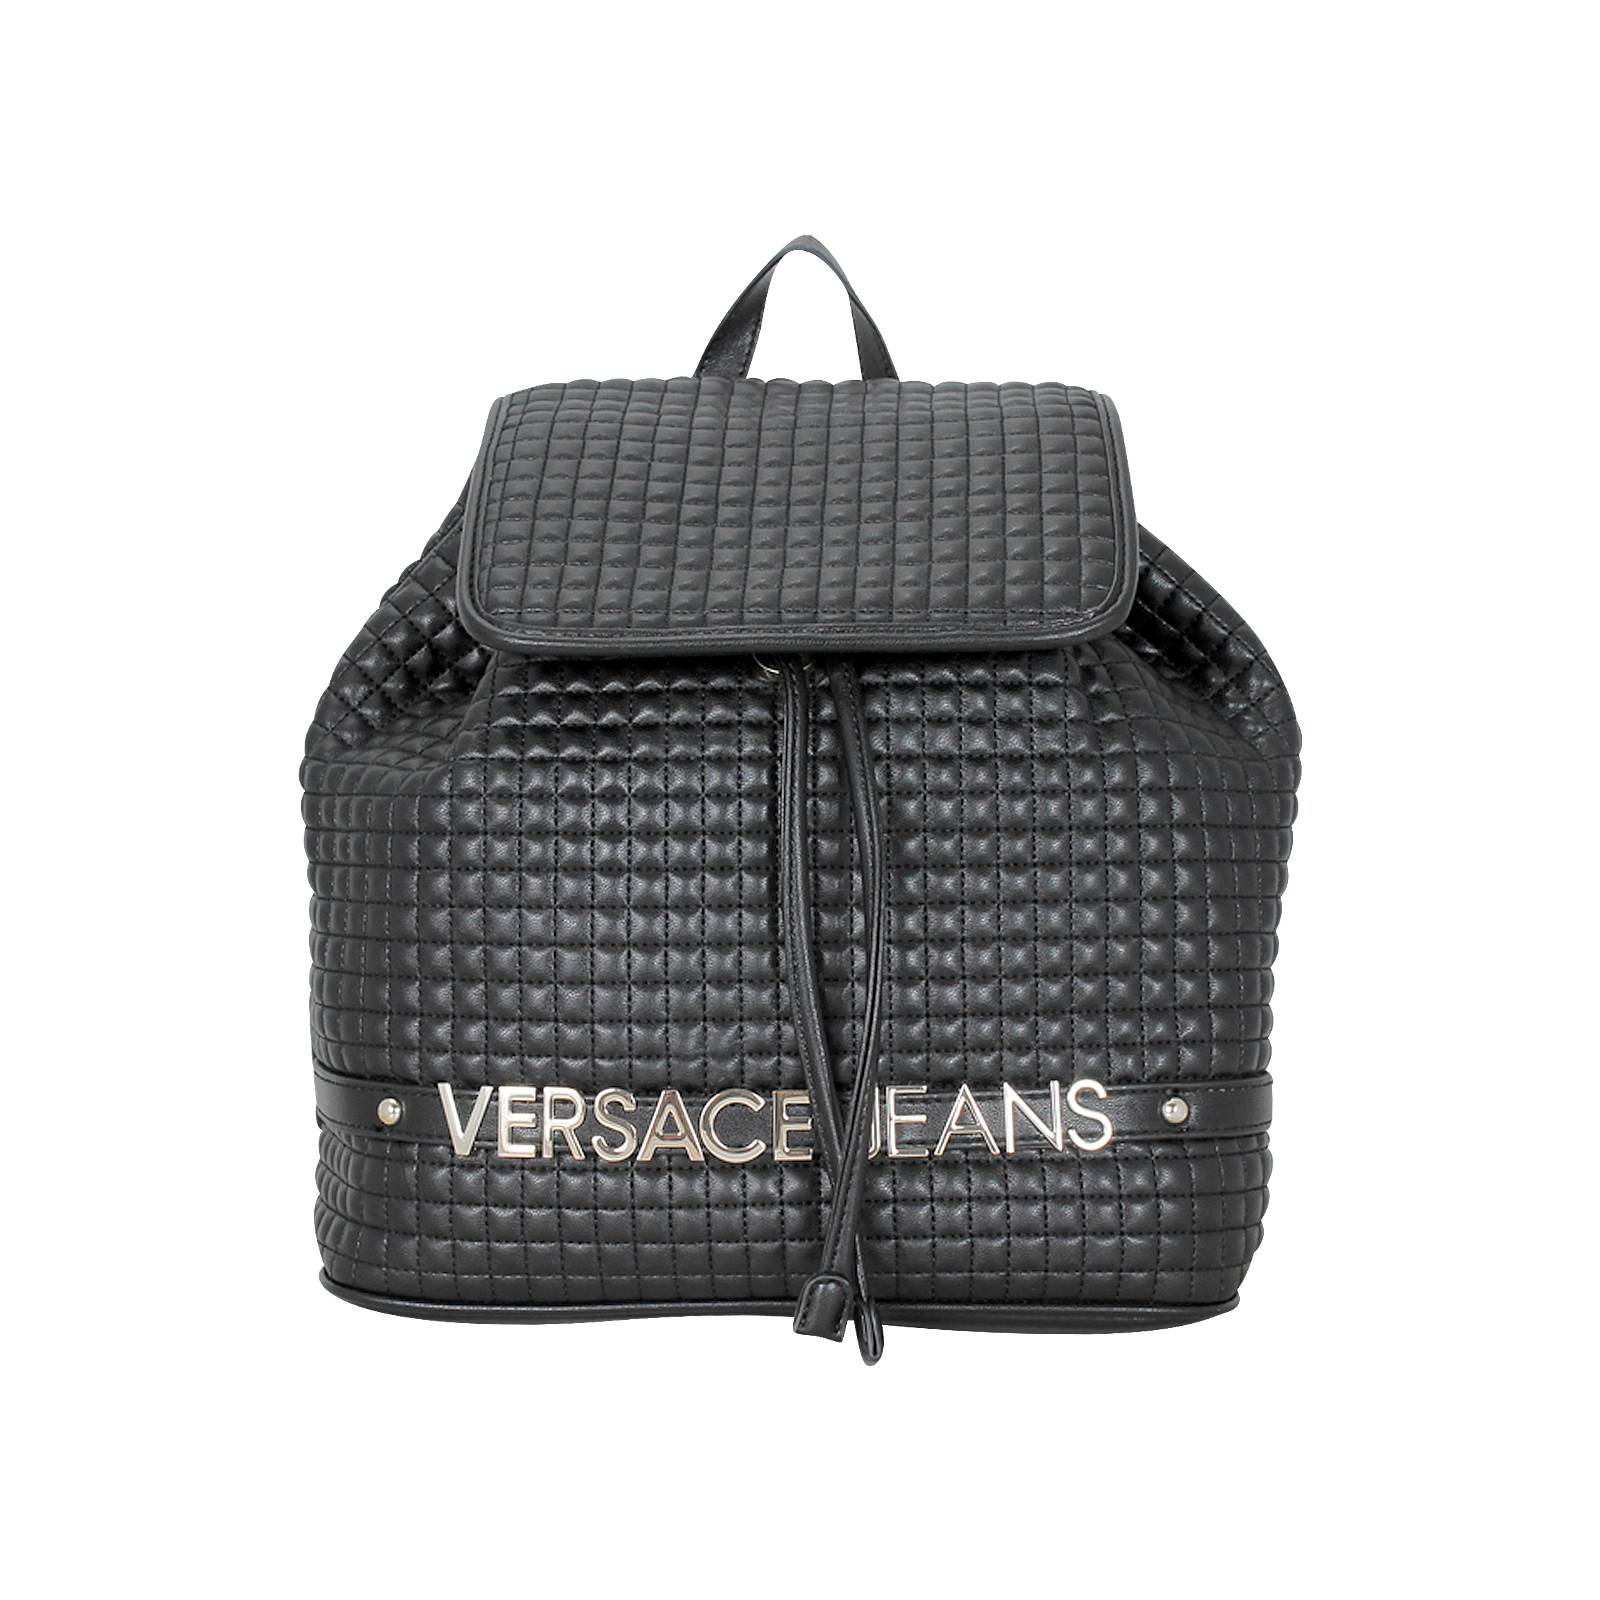 3ba23306ad Talmage - Γυναικεία τσάντα Versace Jeans από δερμα συνθετικο ...